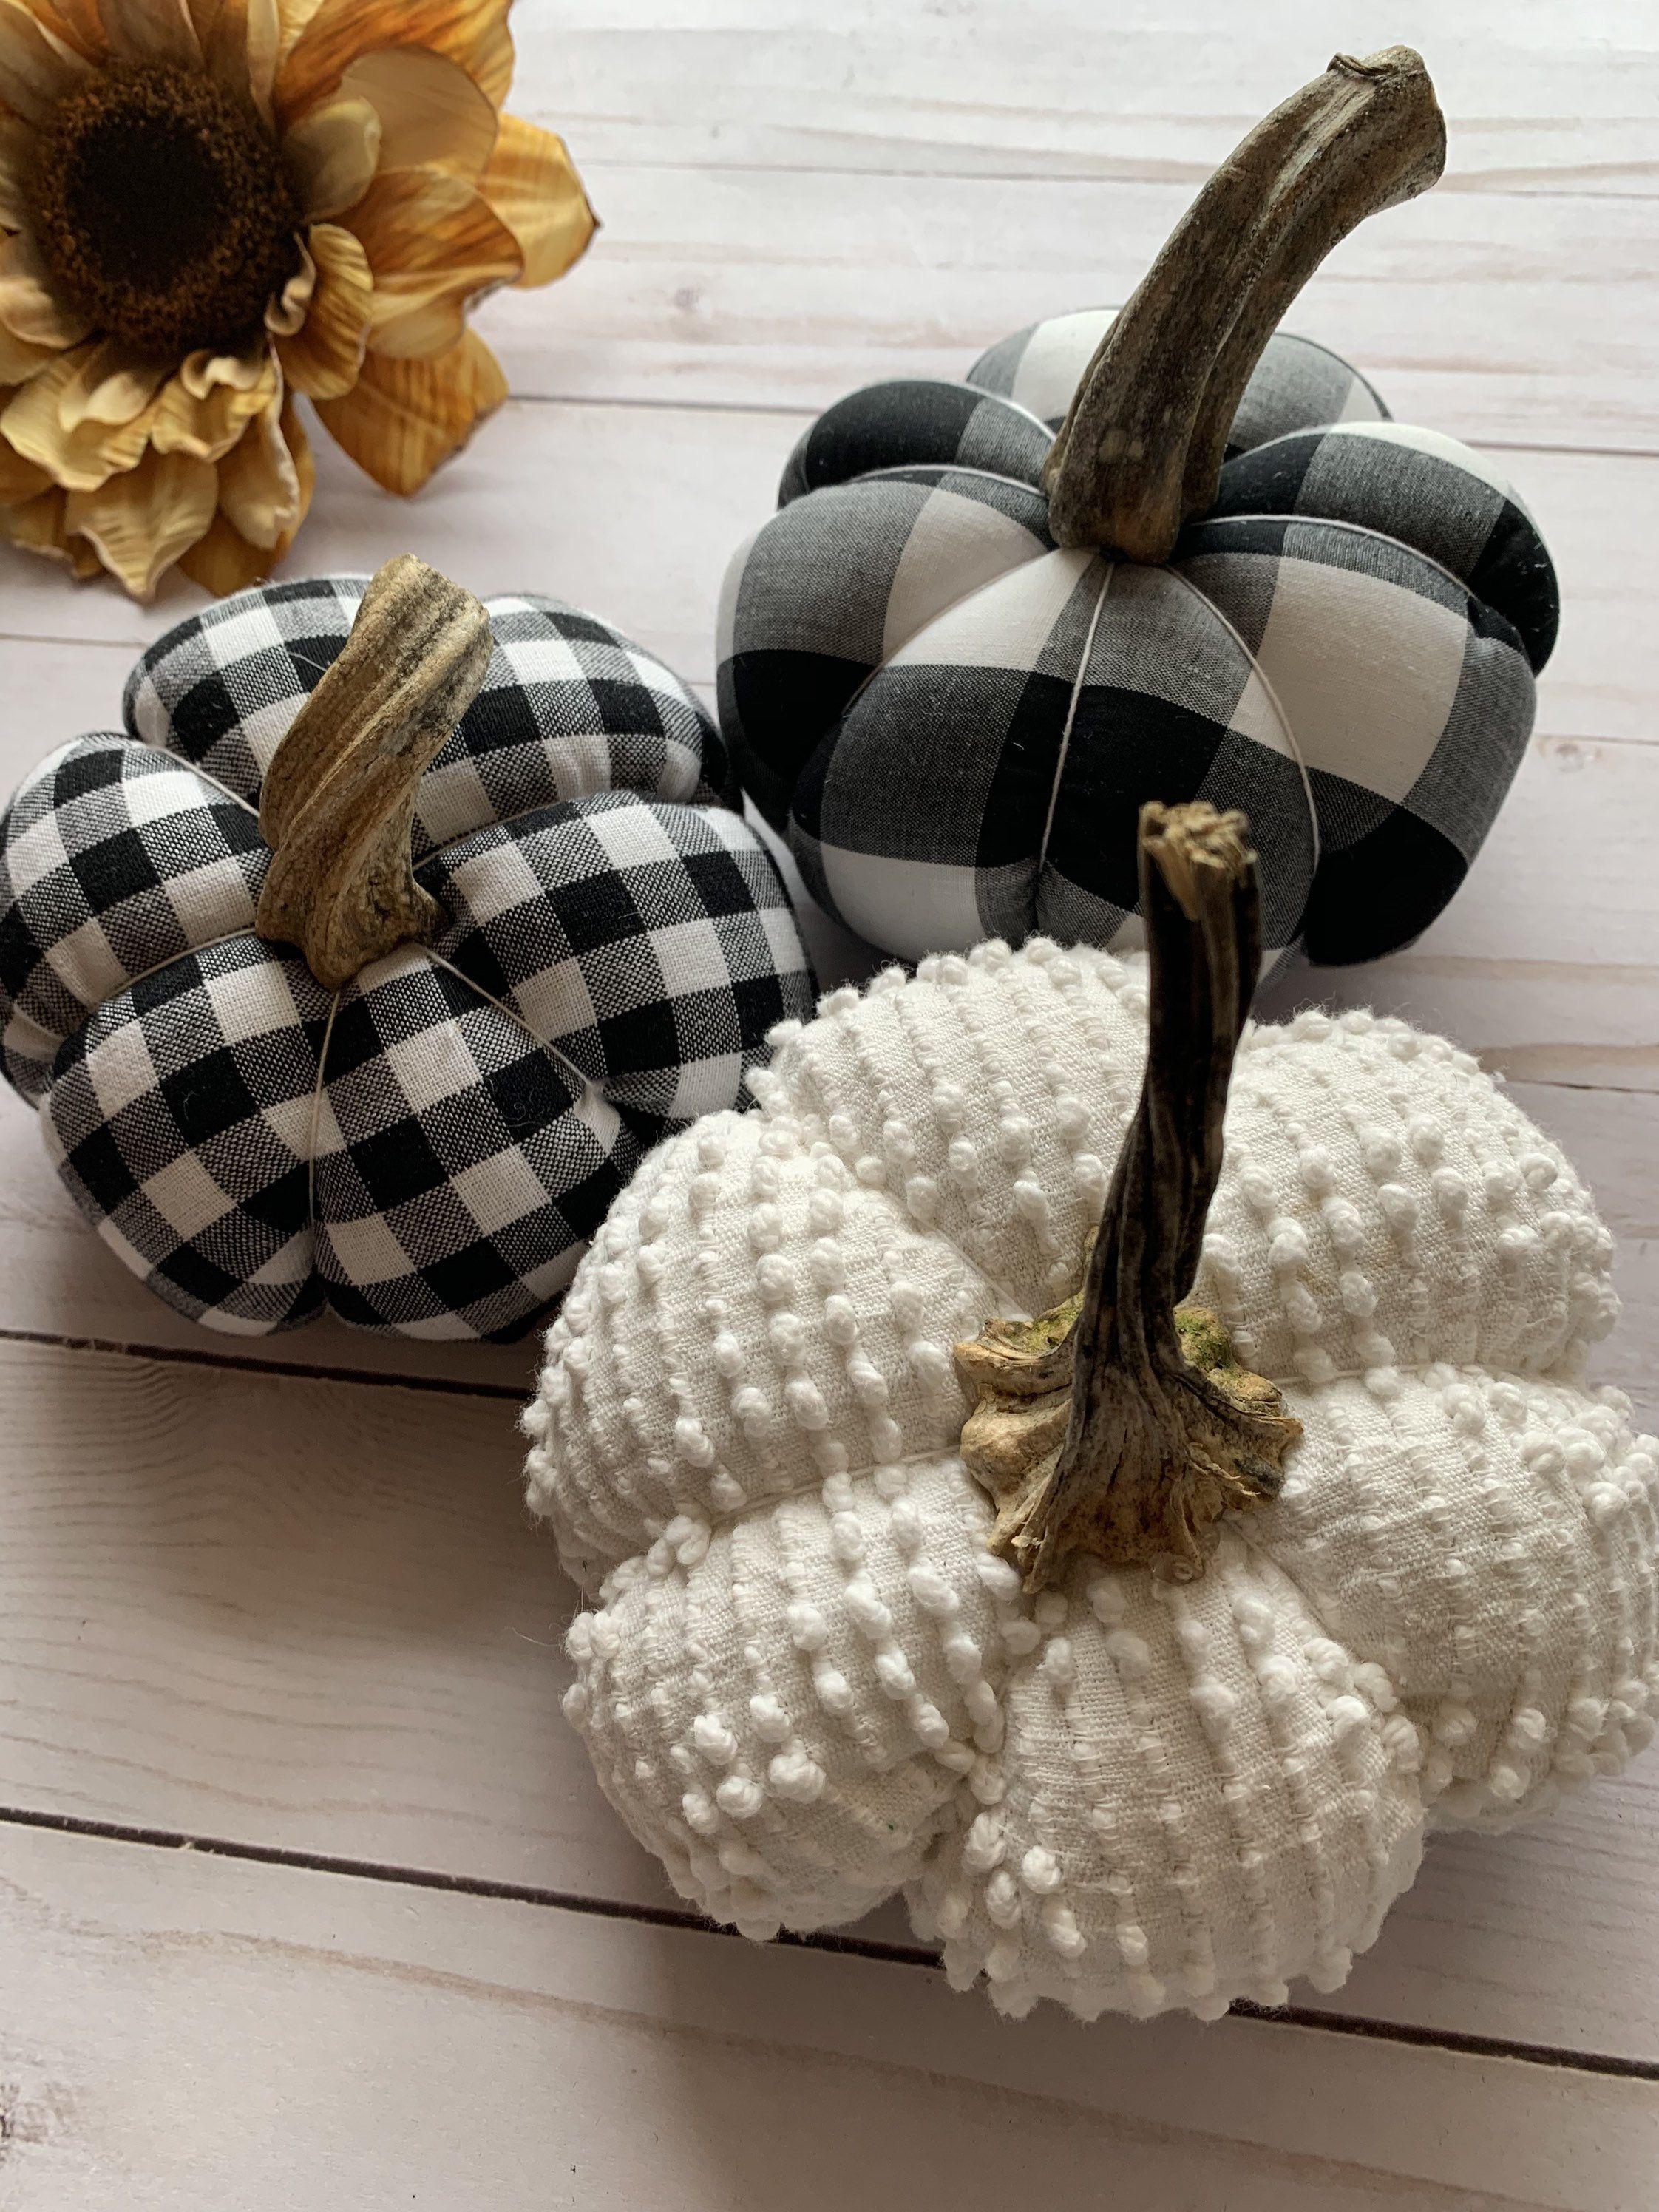 Farmhouse Buffalo Plaid Fabric Pumpkin Decor Fall Decor Black and White